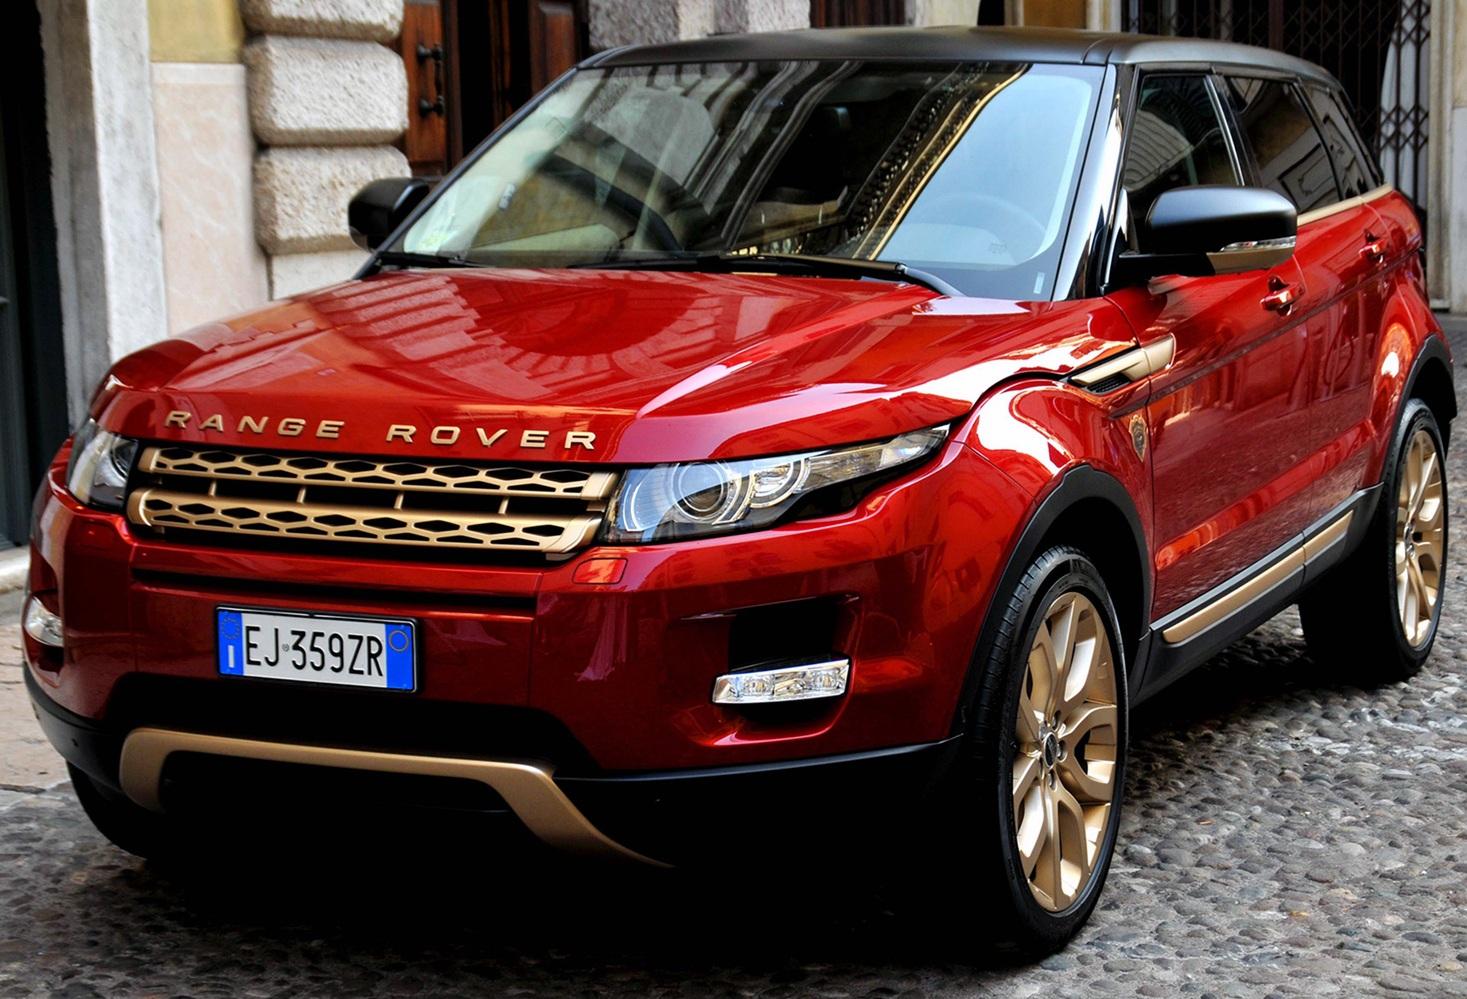 Range Rover Sport Dimensions >> EVOQUE - Range Rover Evoque tuning - SUV Tuning